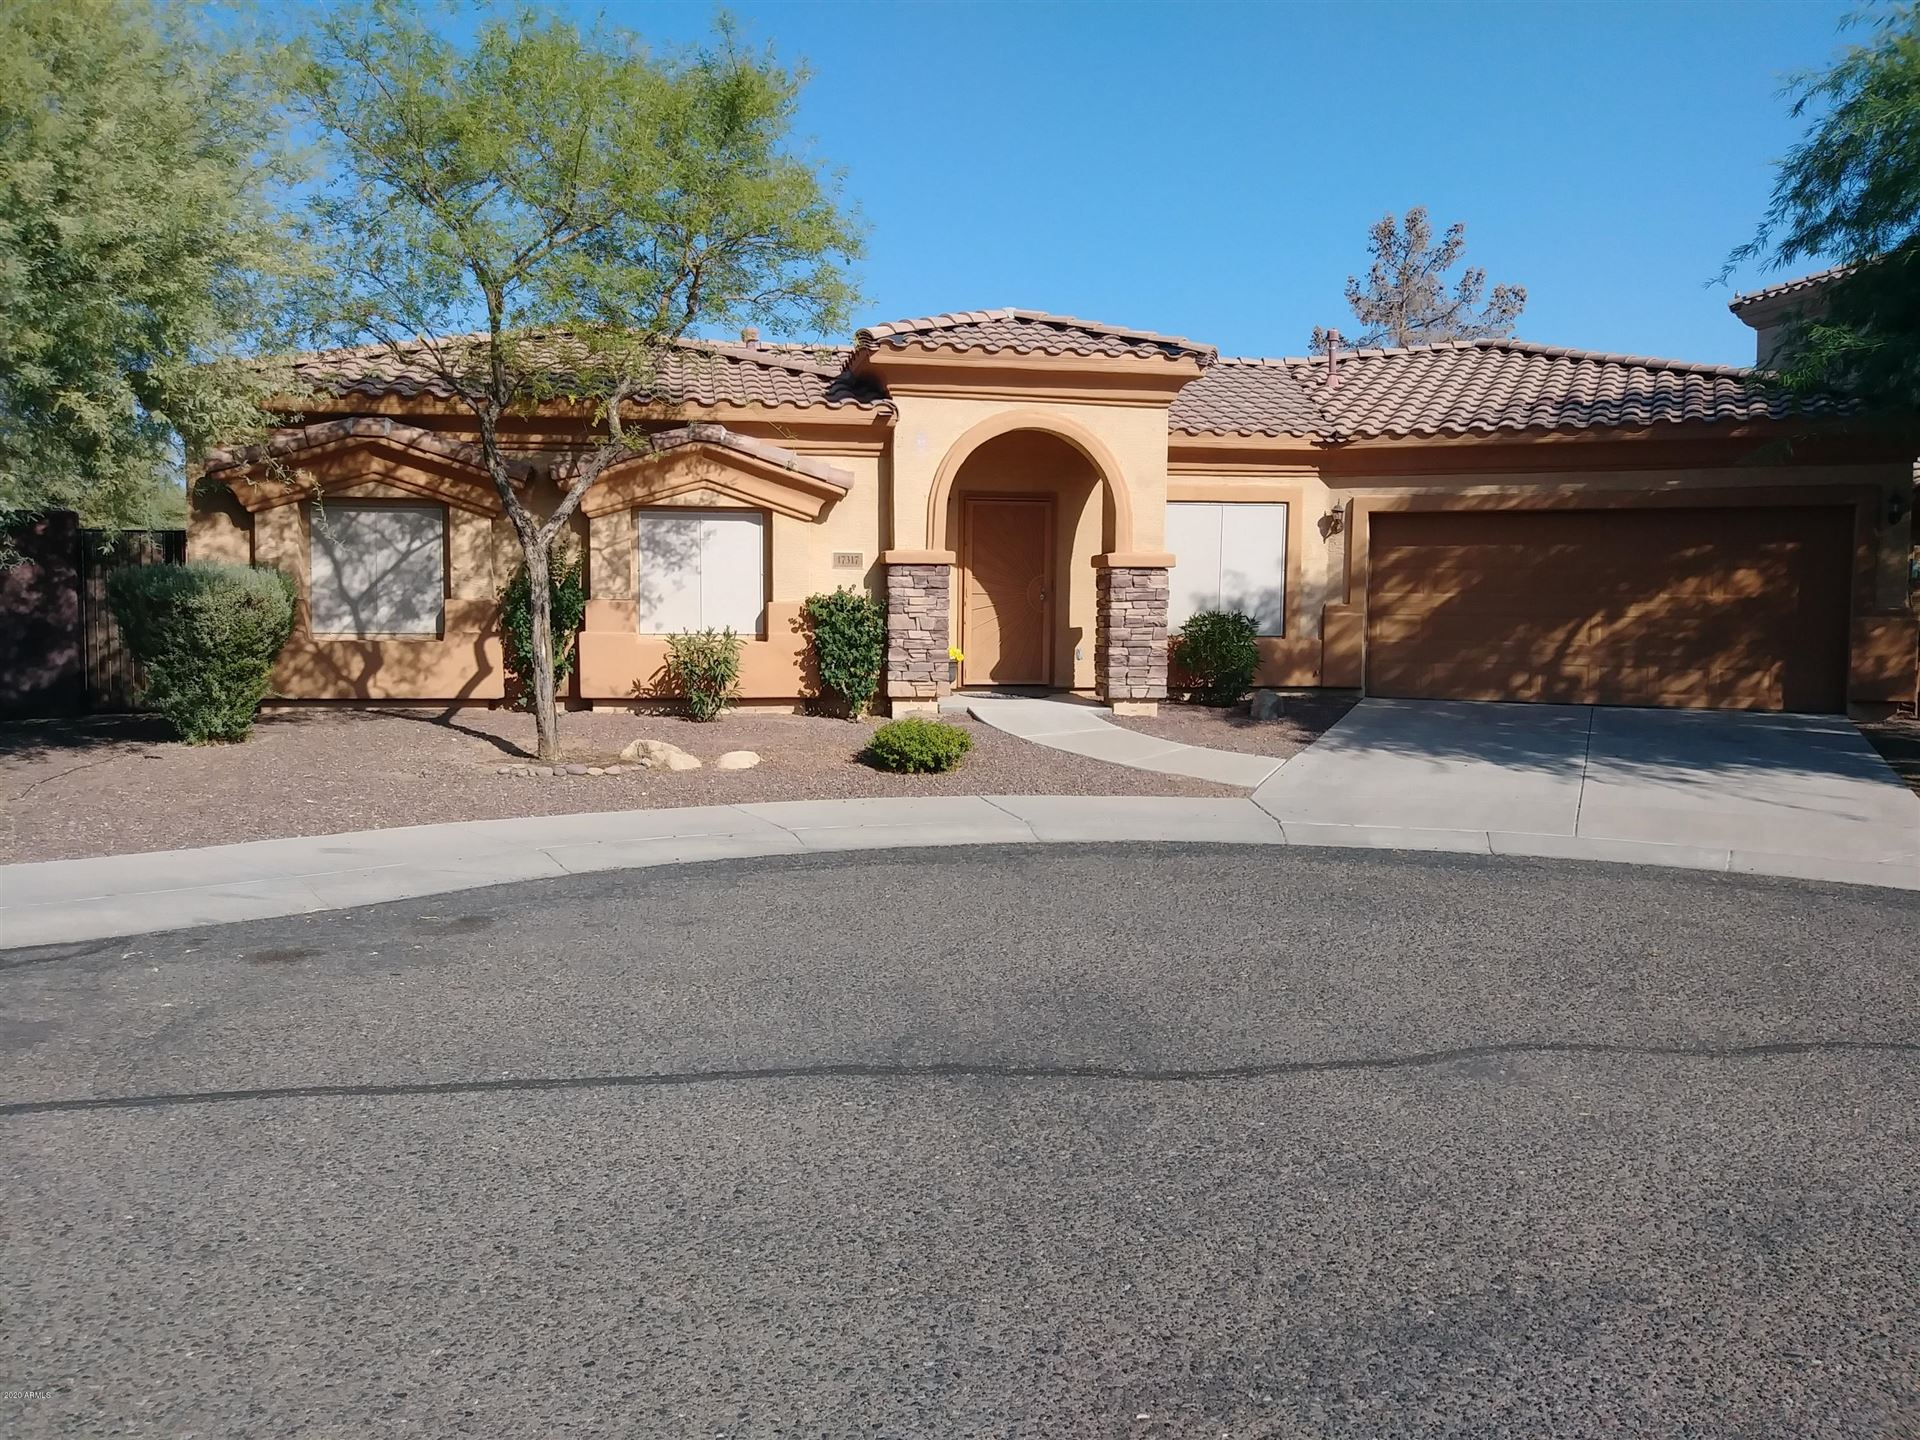 17317 N 19TH Terrace, Phoenix, AZ 85022 - MLS#: 6137301